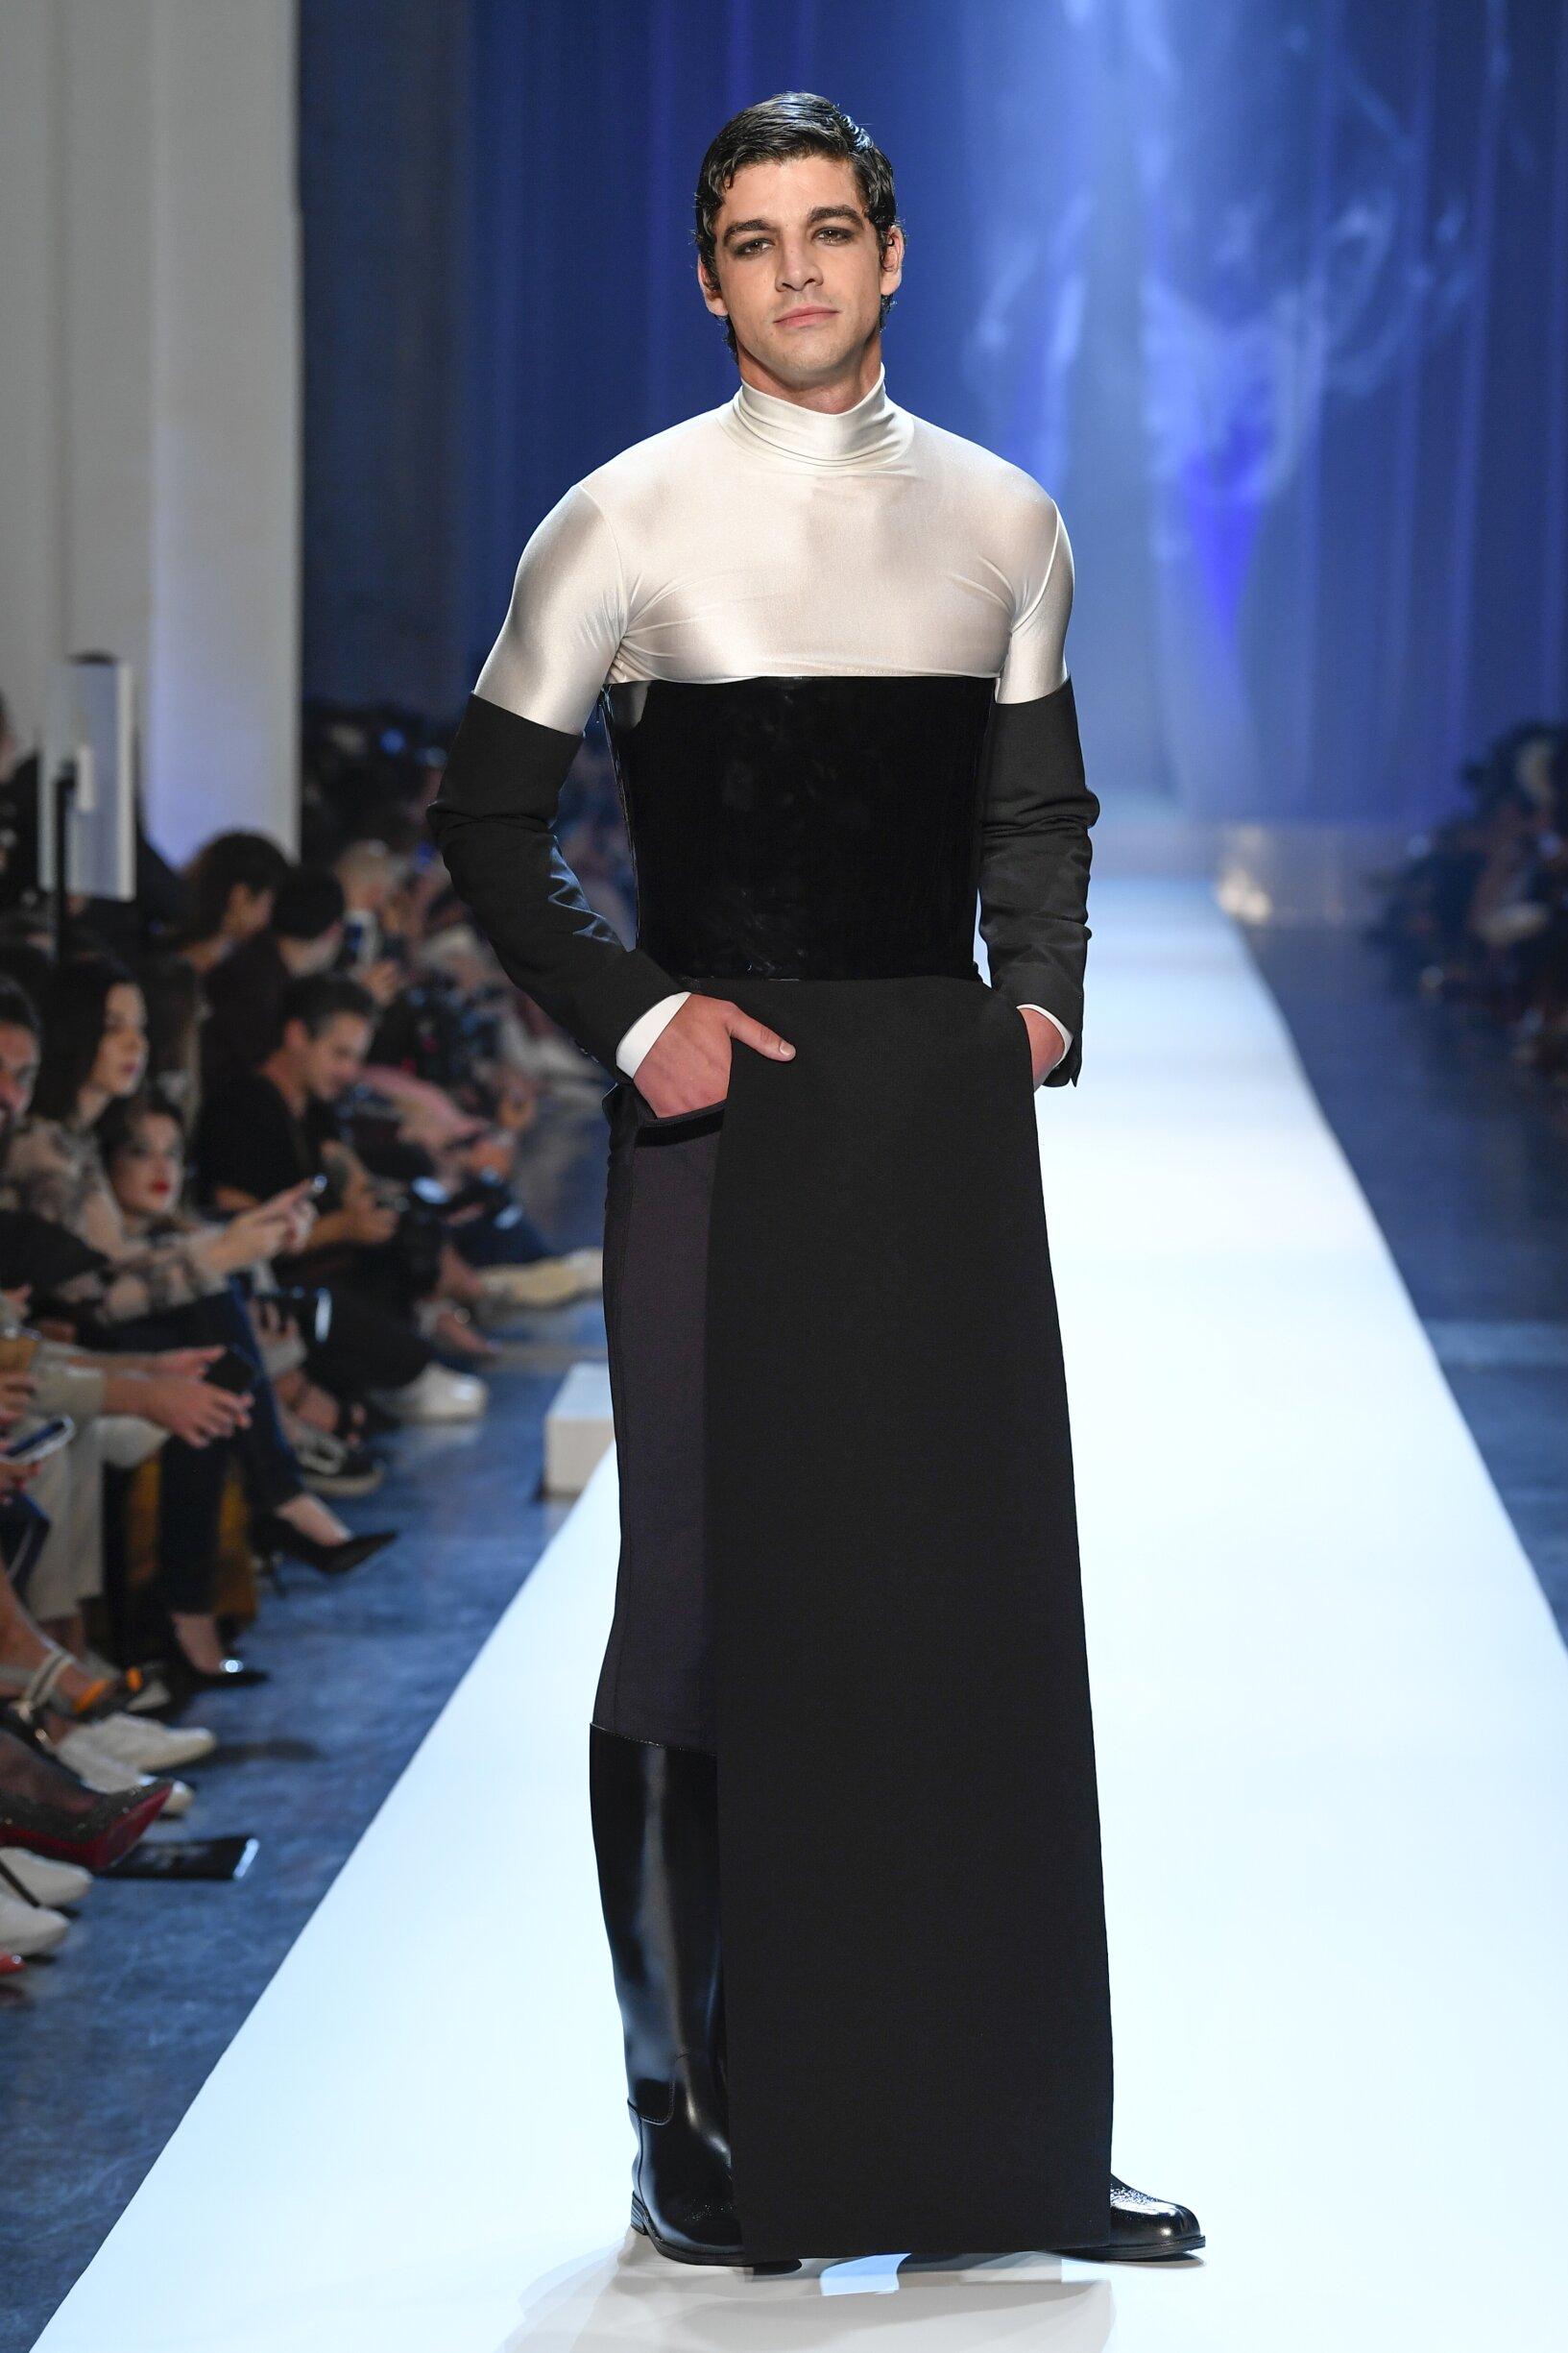 Runway Jean-Paul Gaultier Haute Couture Fall Winter 2018 Men's Collection Paris Fashion Week